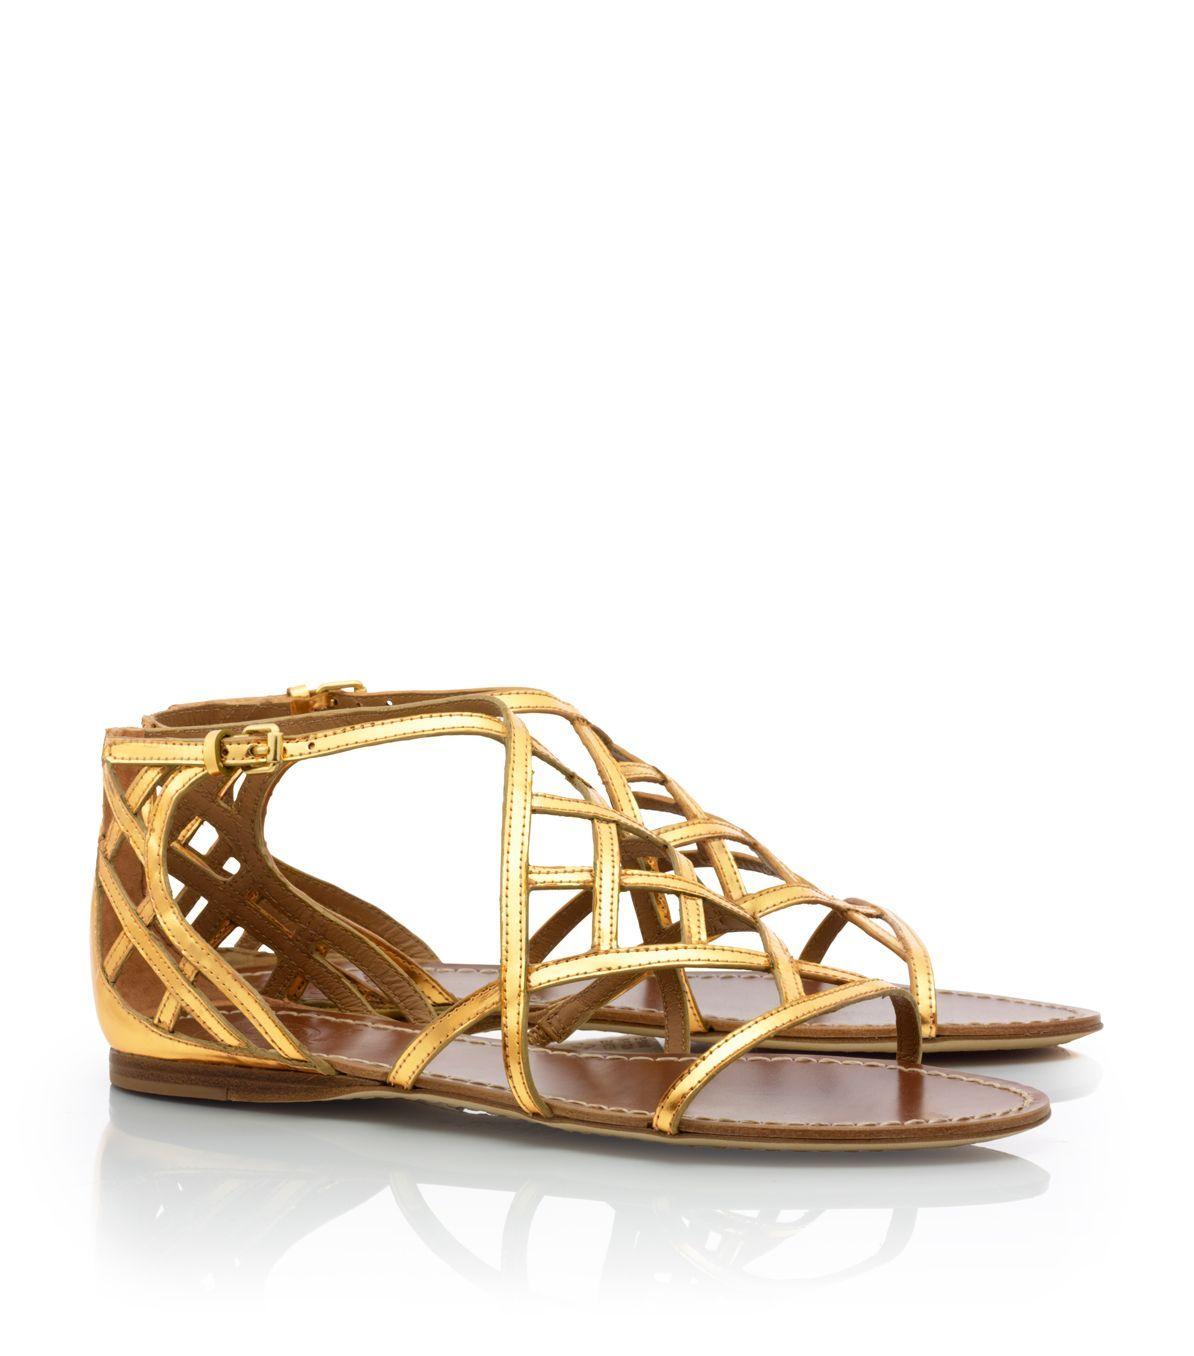 21b00f41d32c5b gorgeous Tory Burch sandal... totally on sale!